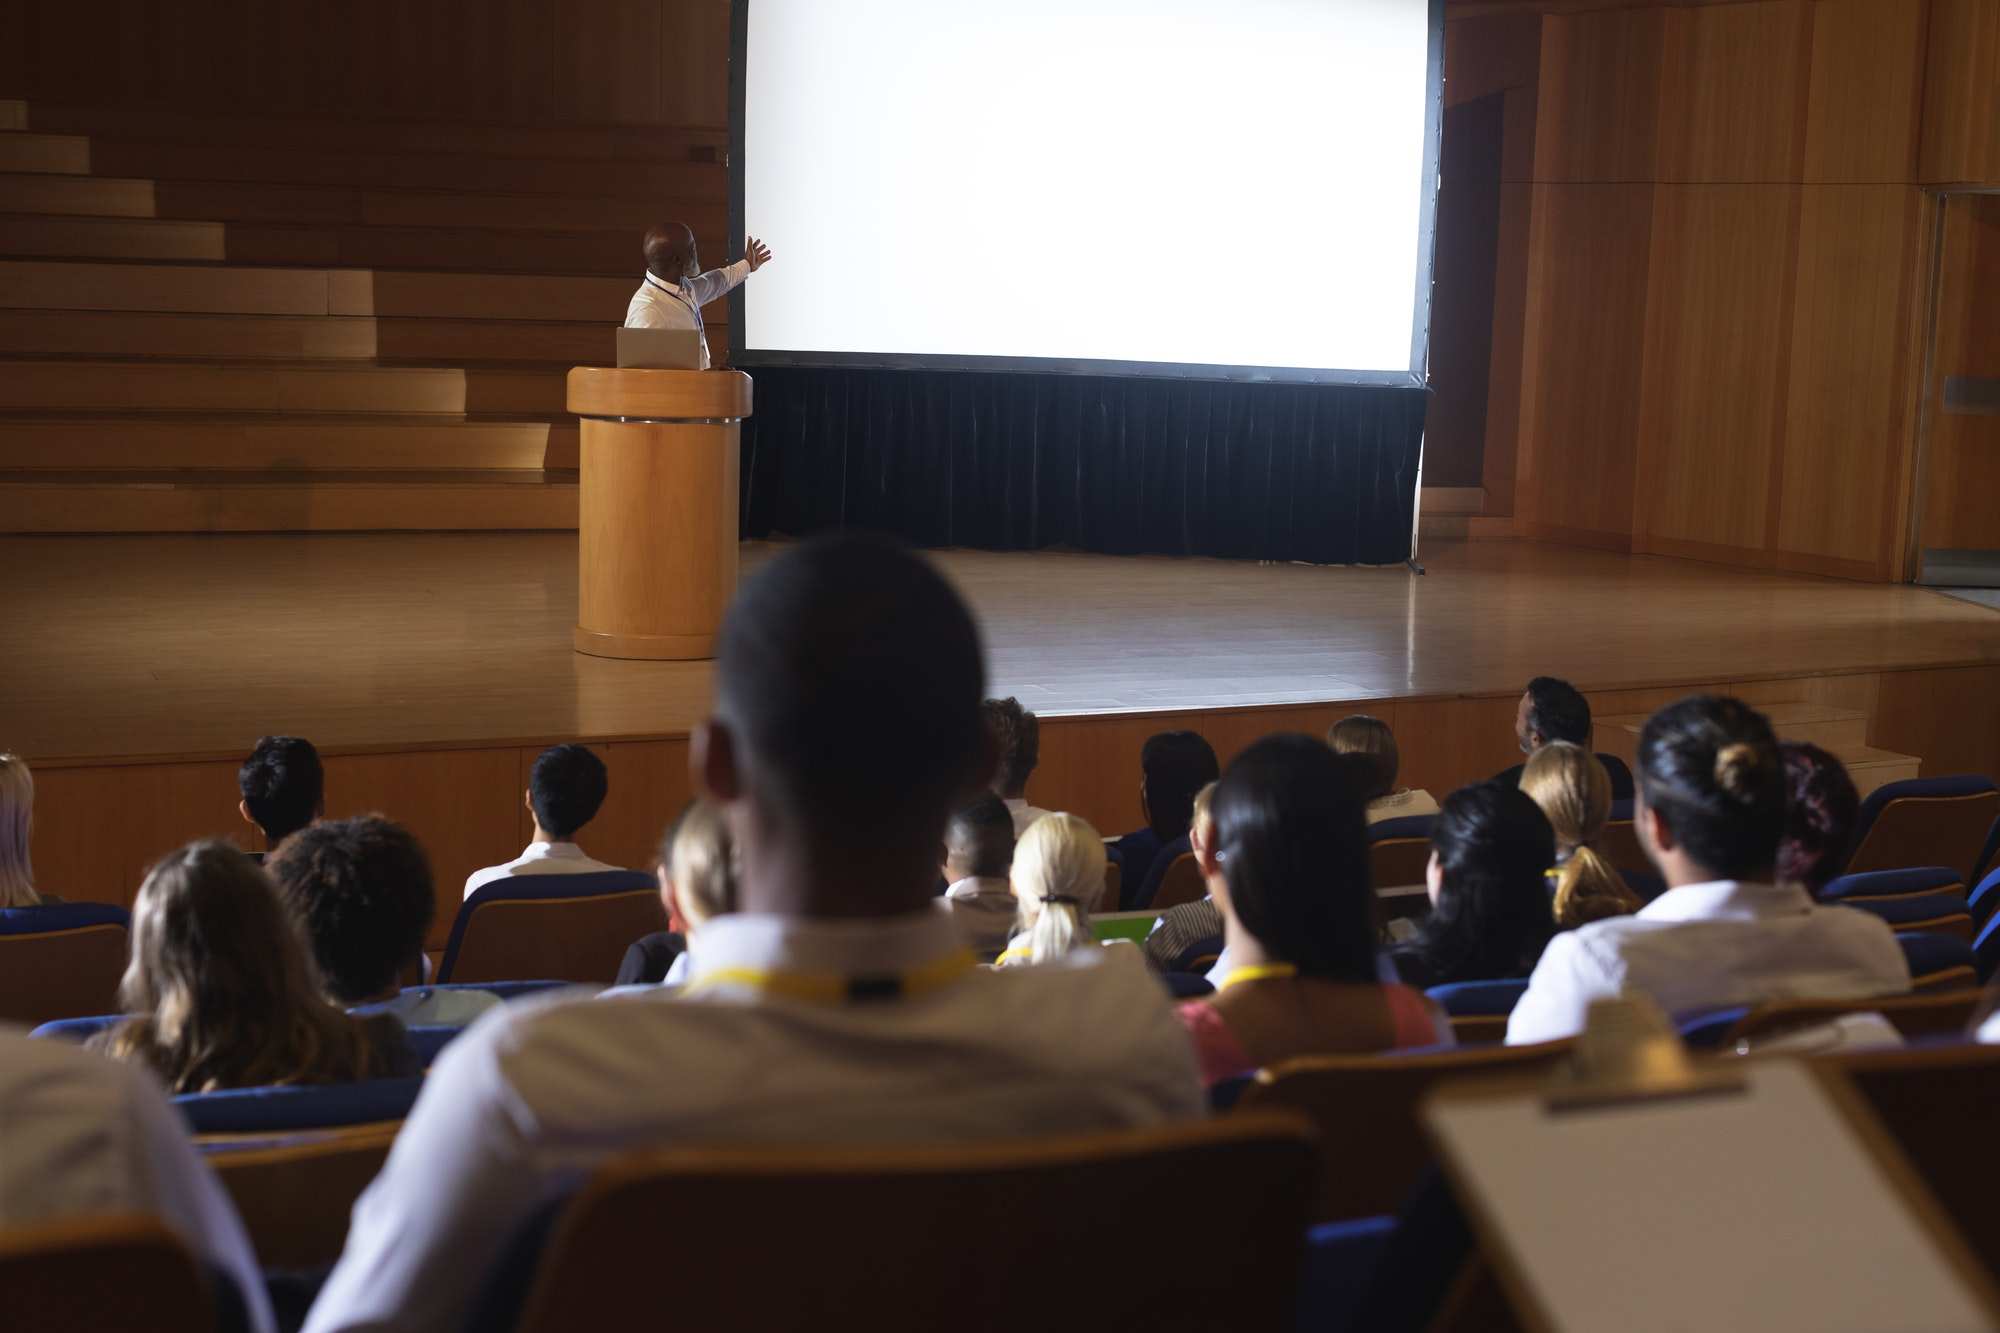 Businessman standing around podium and giving presentation in the auditorium